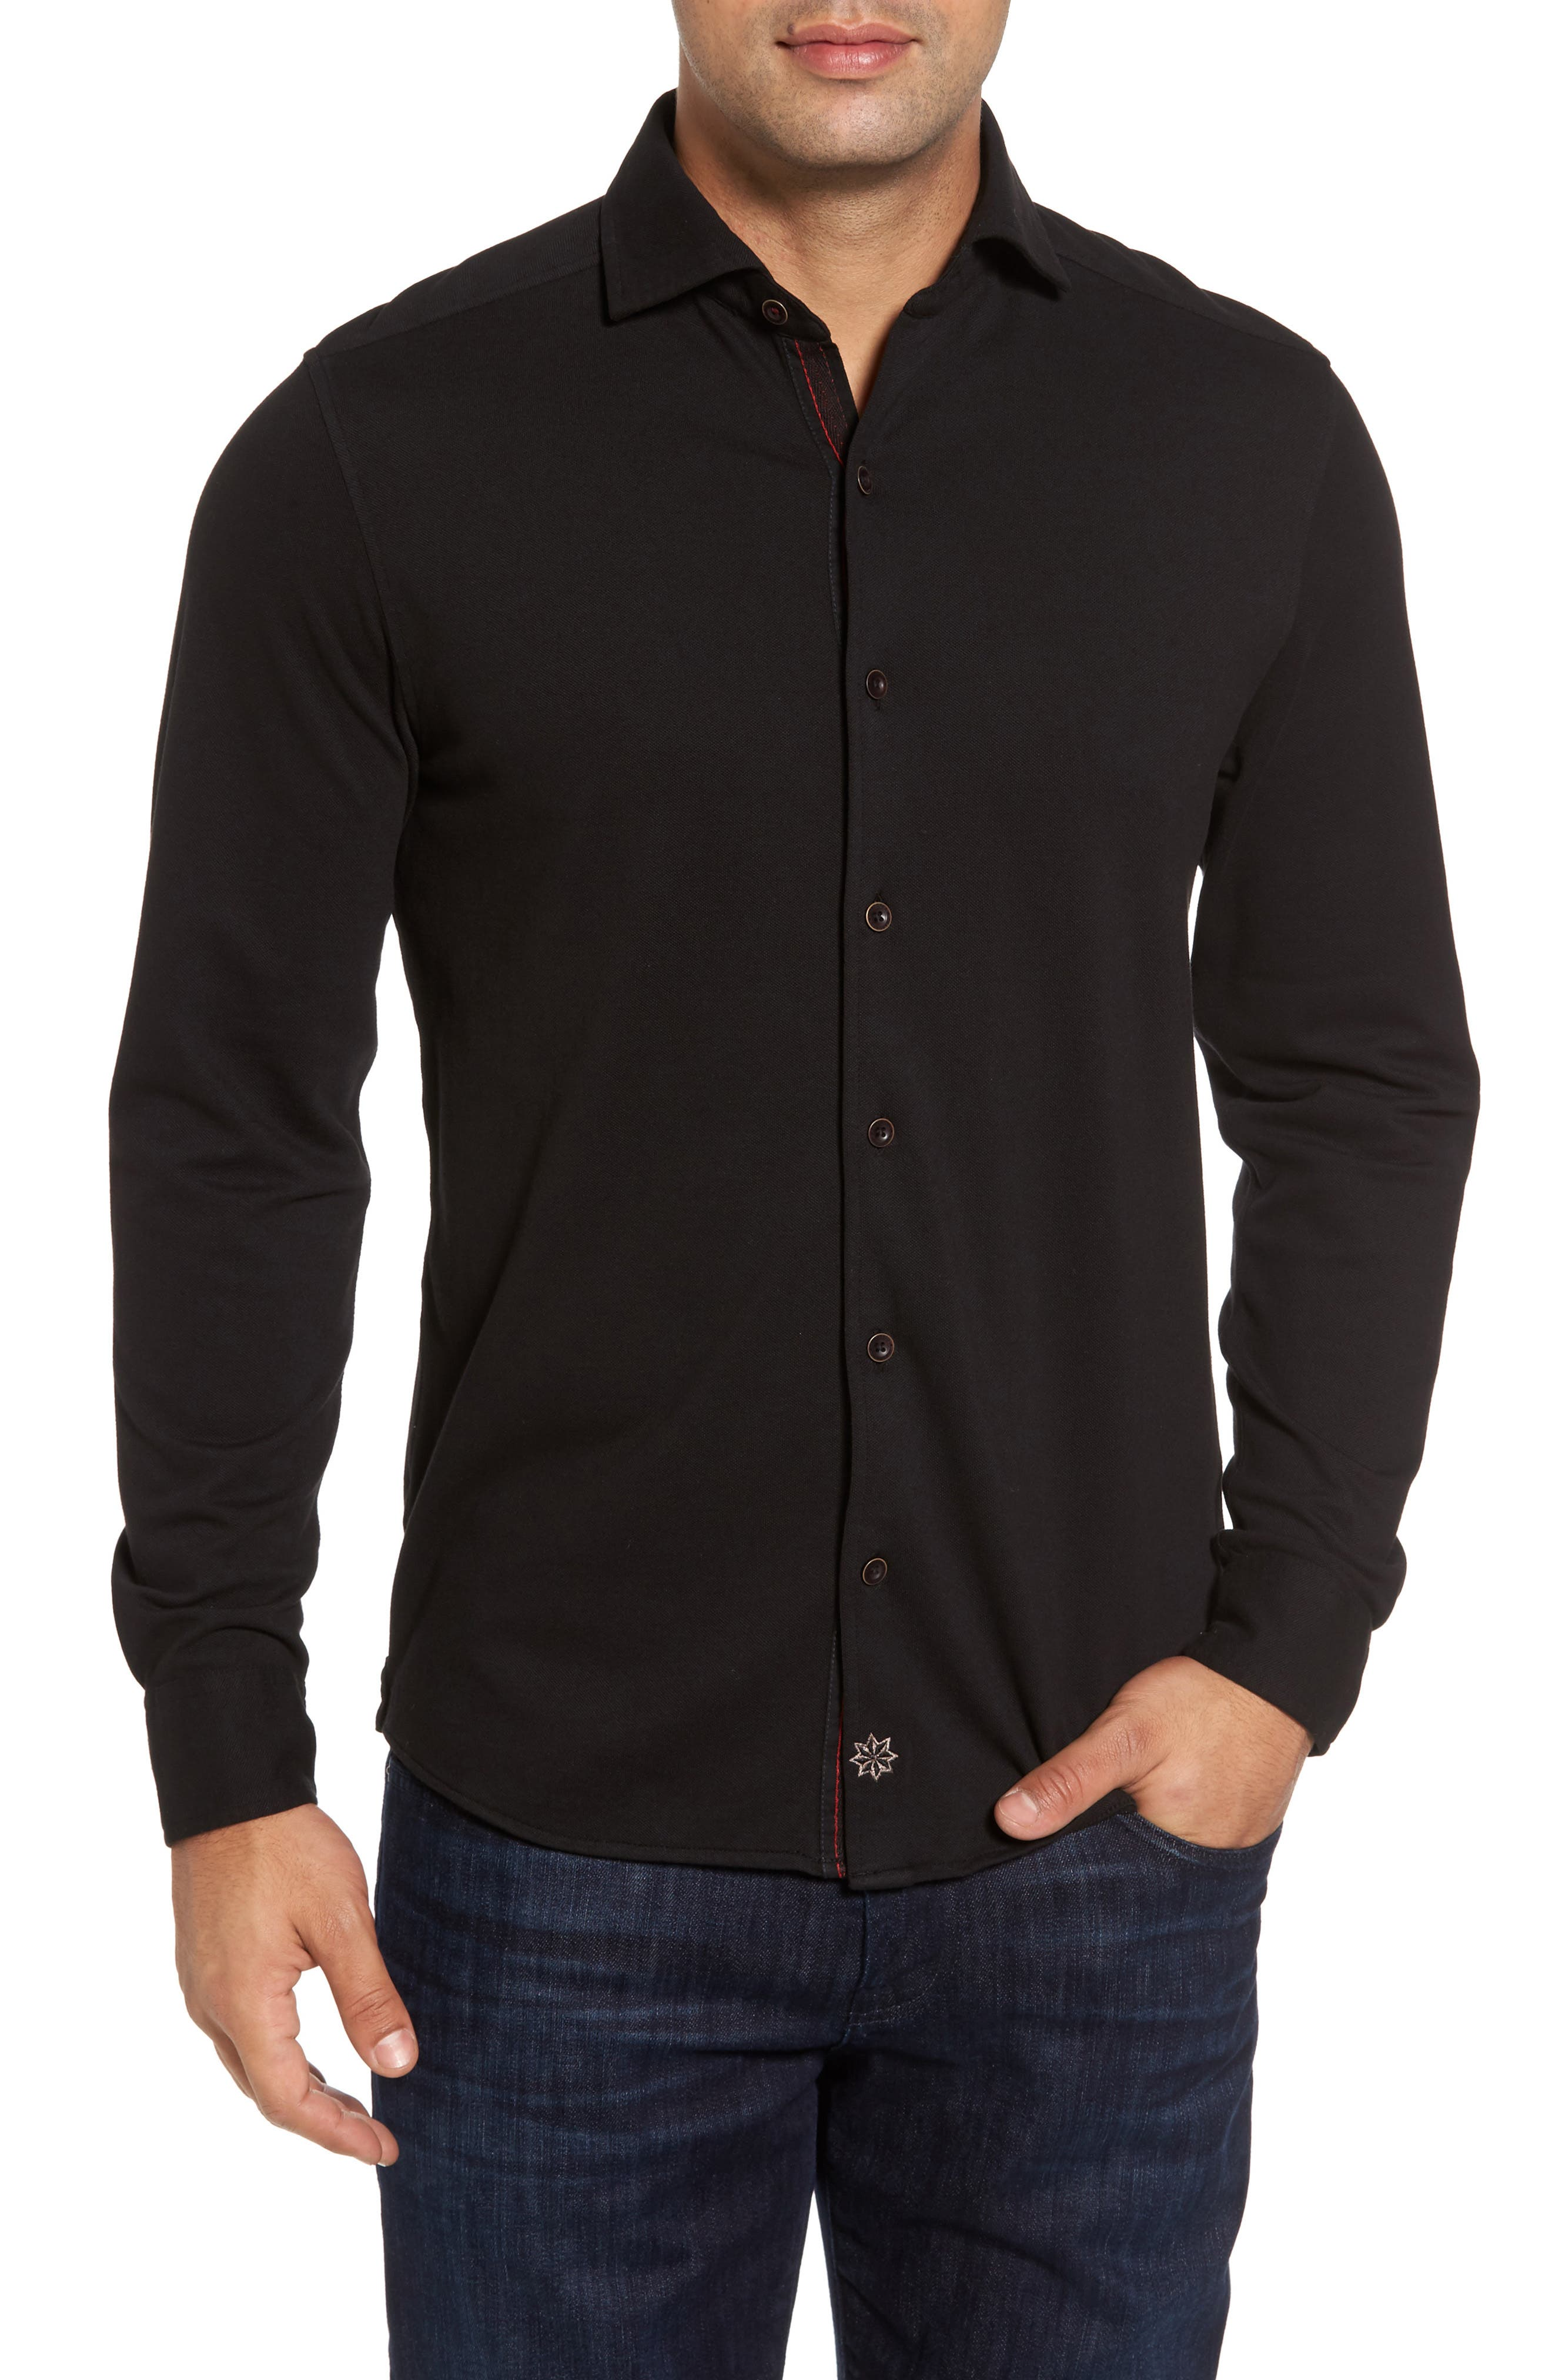 Shively Piqué Knit Sport Shirt,                             Main thumbnail 1, color,                             001